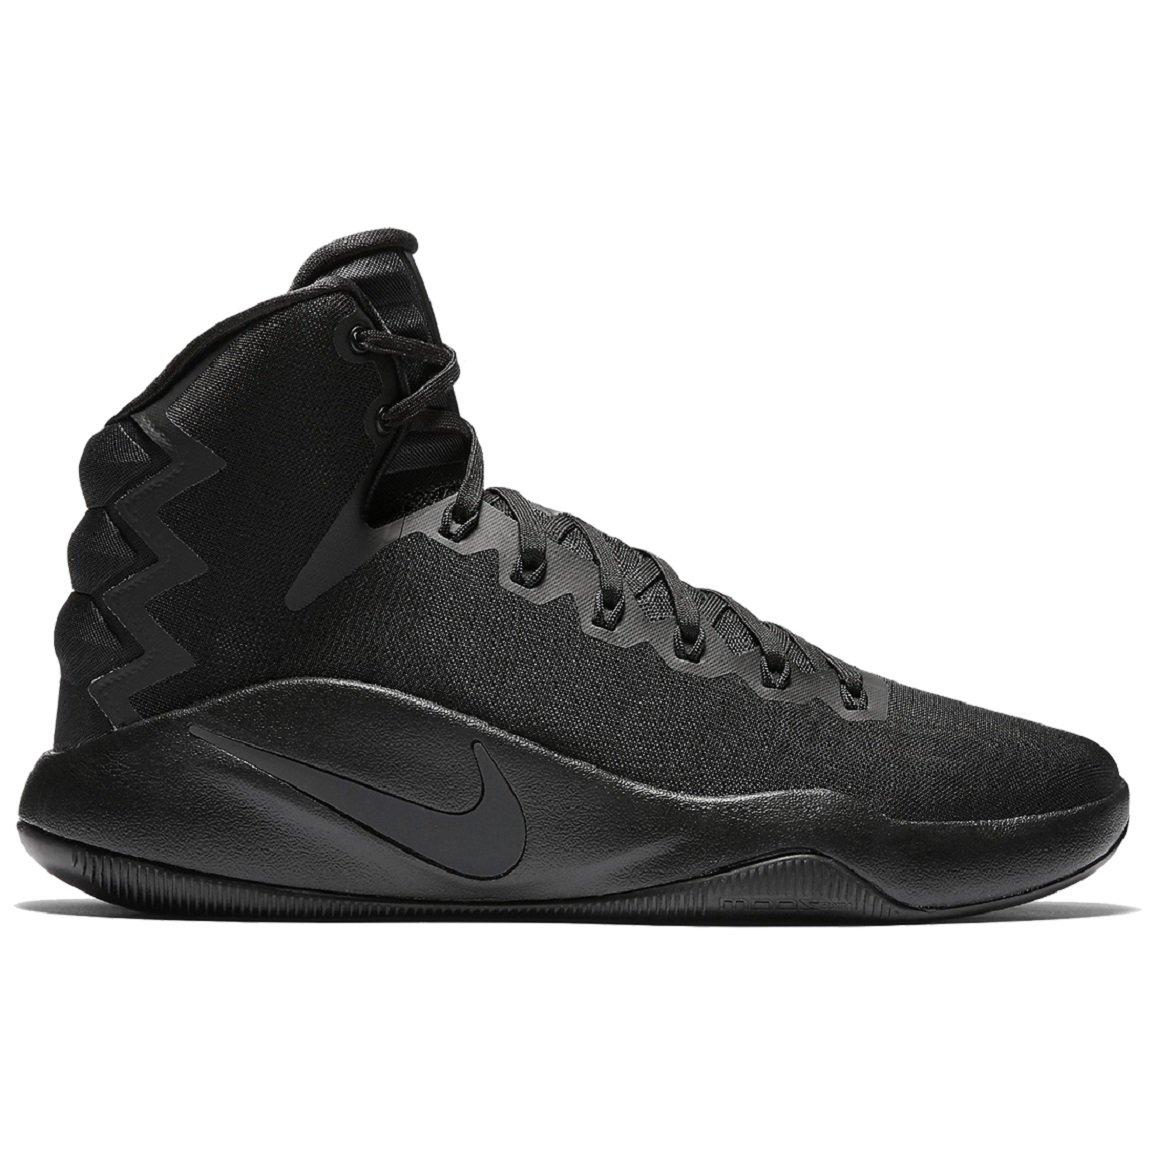 Nike Mens Hyperdunk 2016 Shoes Black/Anthracite/Volt Size 11.5